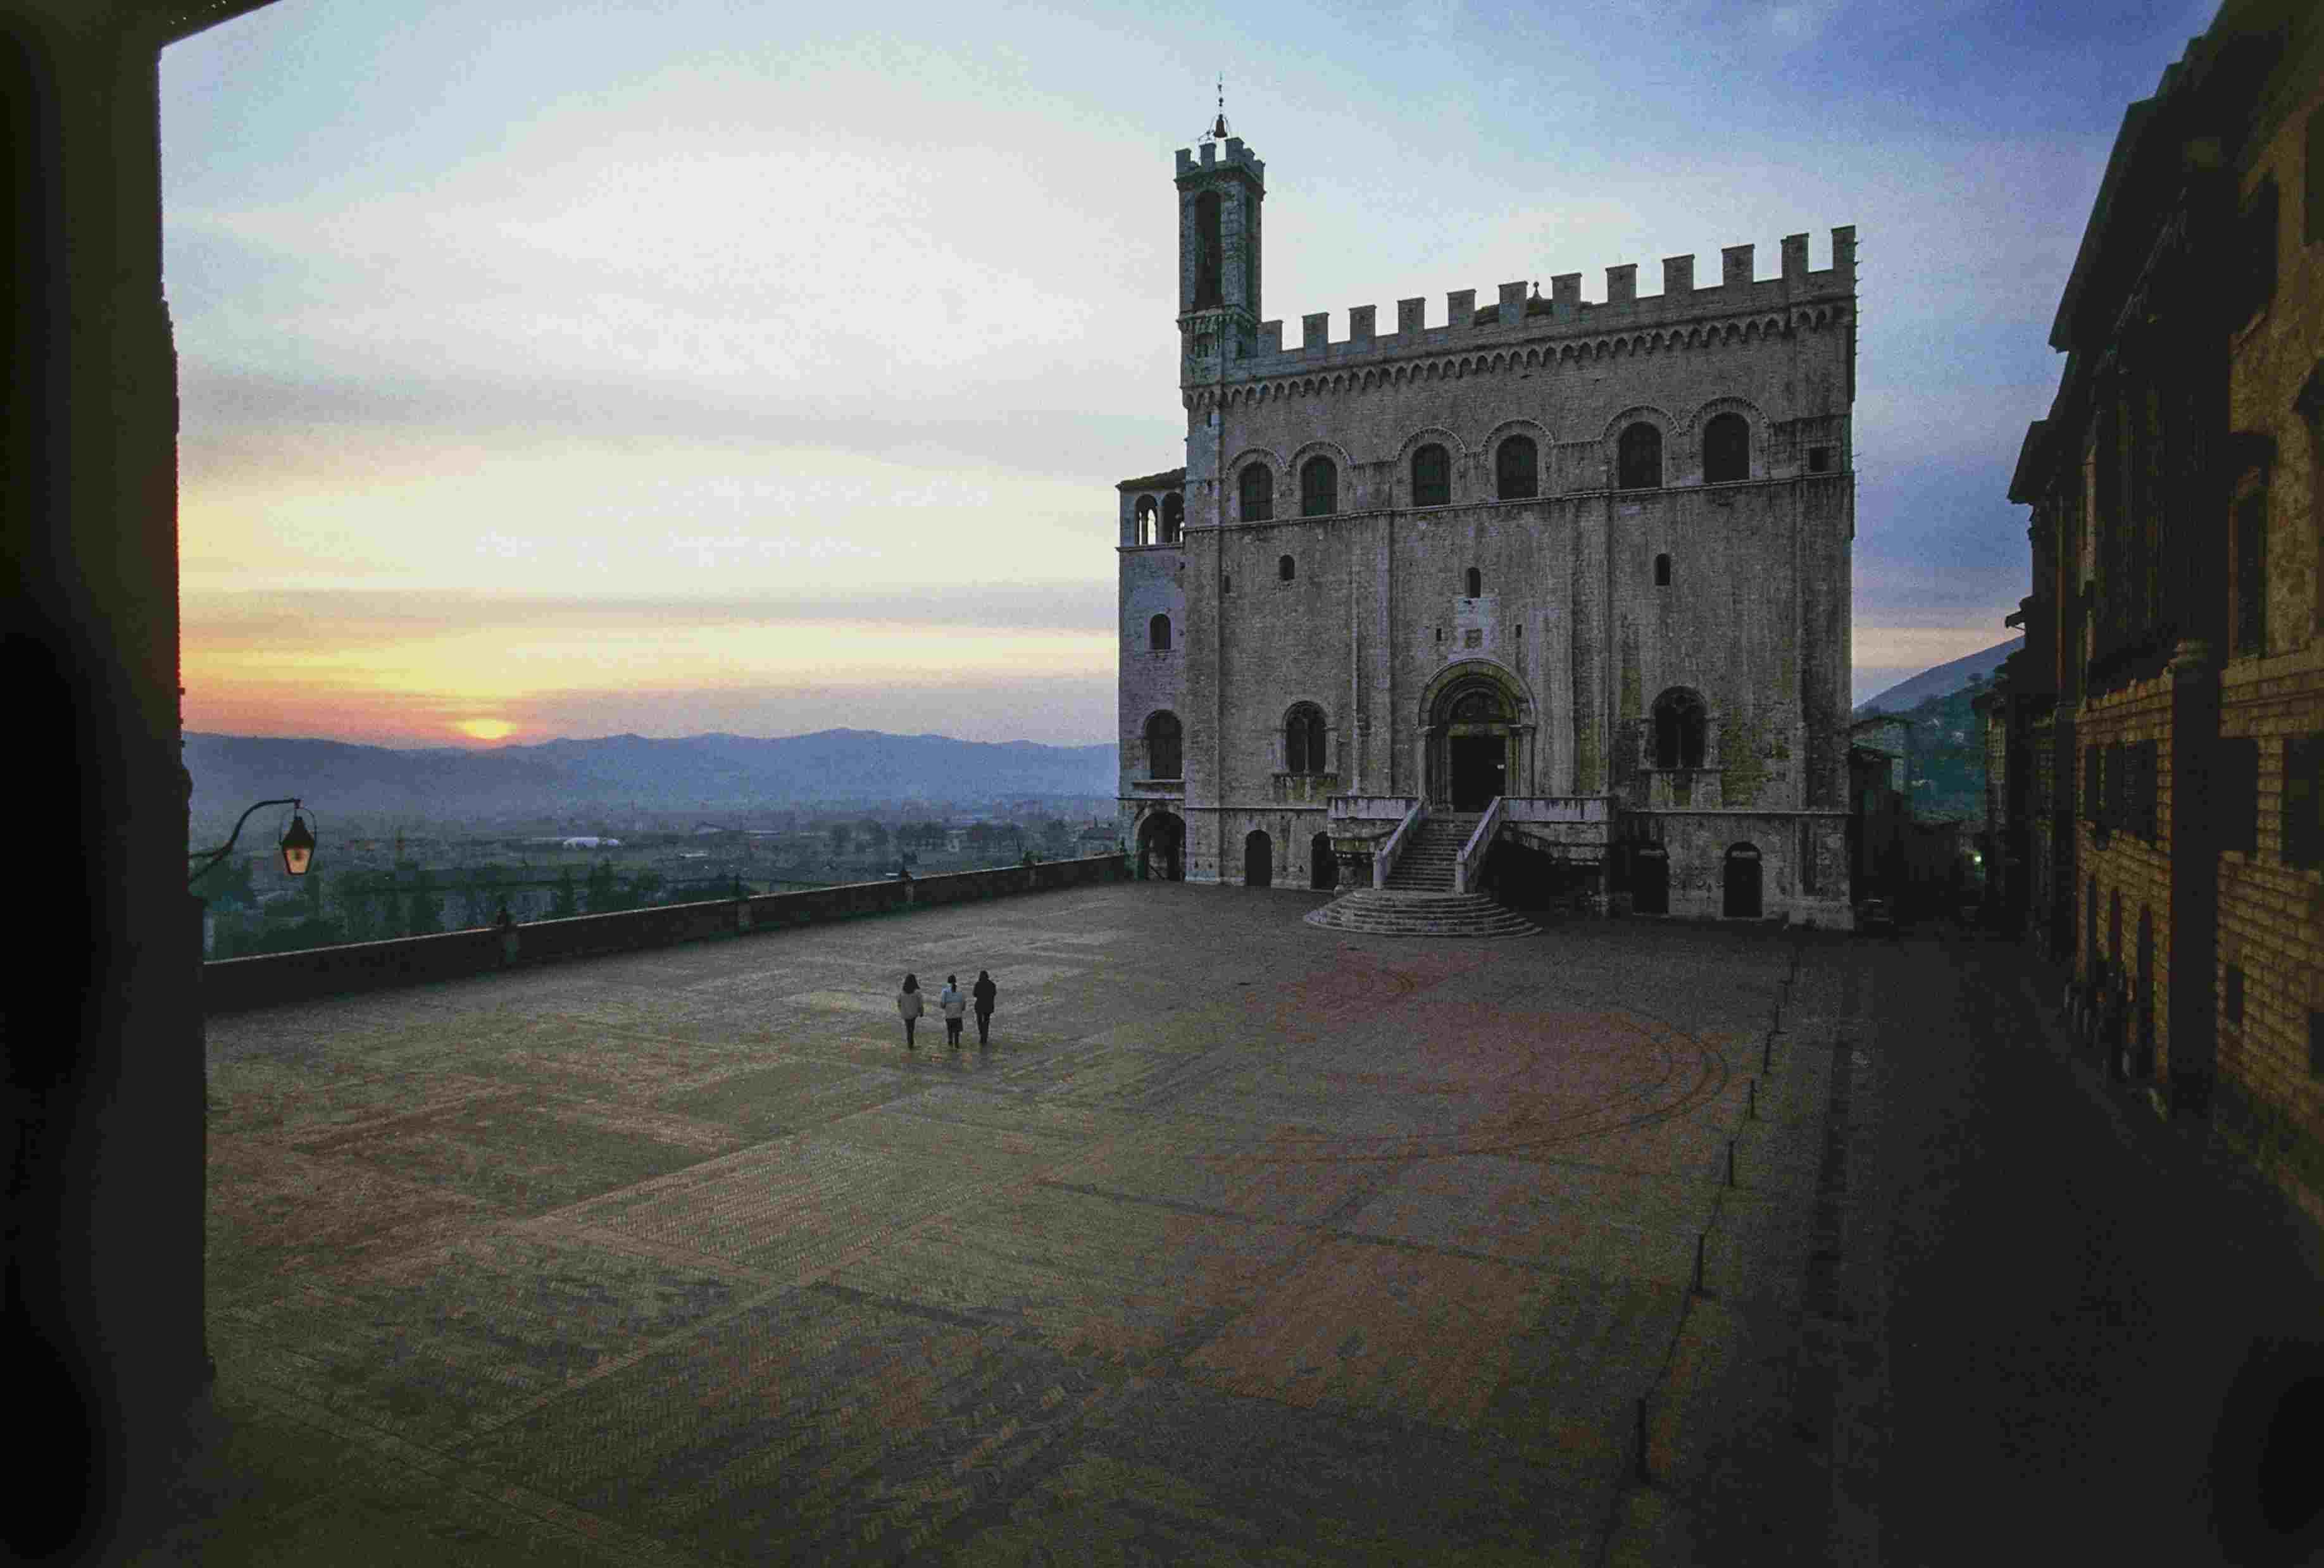 Consuls palace, 1332-1349 and Piazza Grande, sunset, Gubbio, Umbria, Italy, 14th century